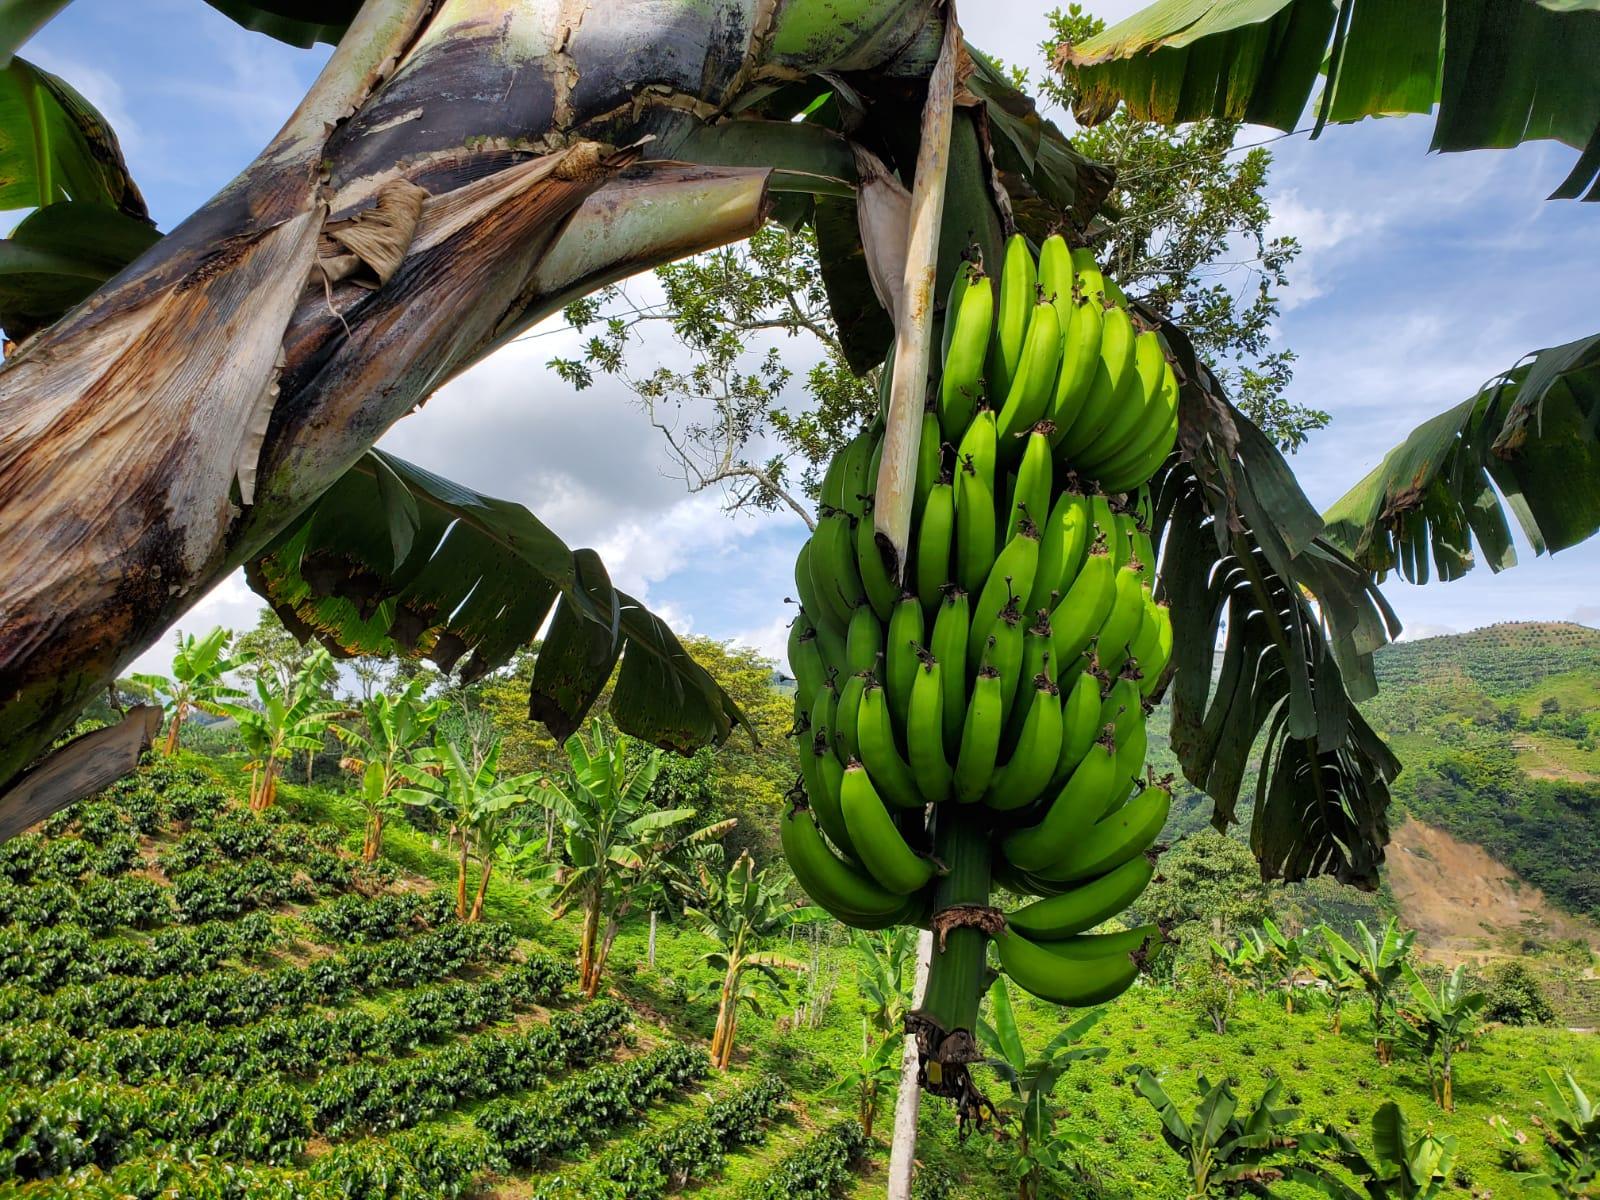 Bananas growing at a Colombian Coffee Farm - Finca Mariposa